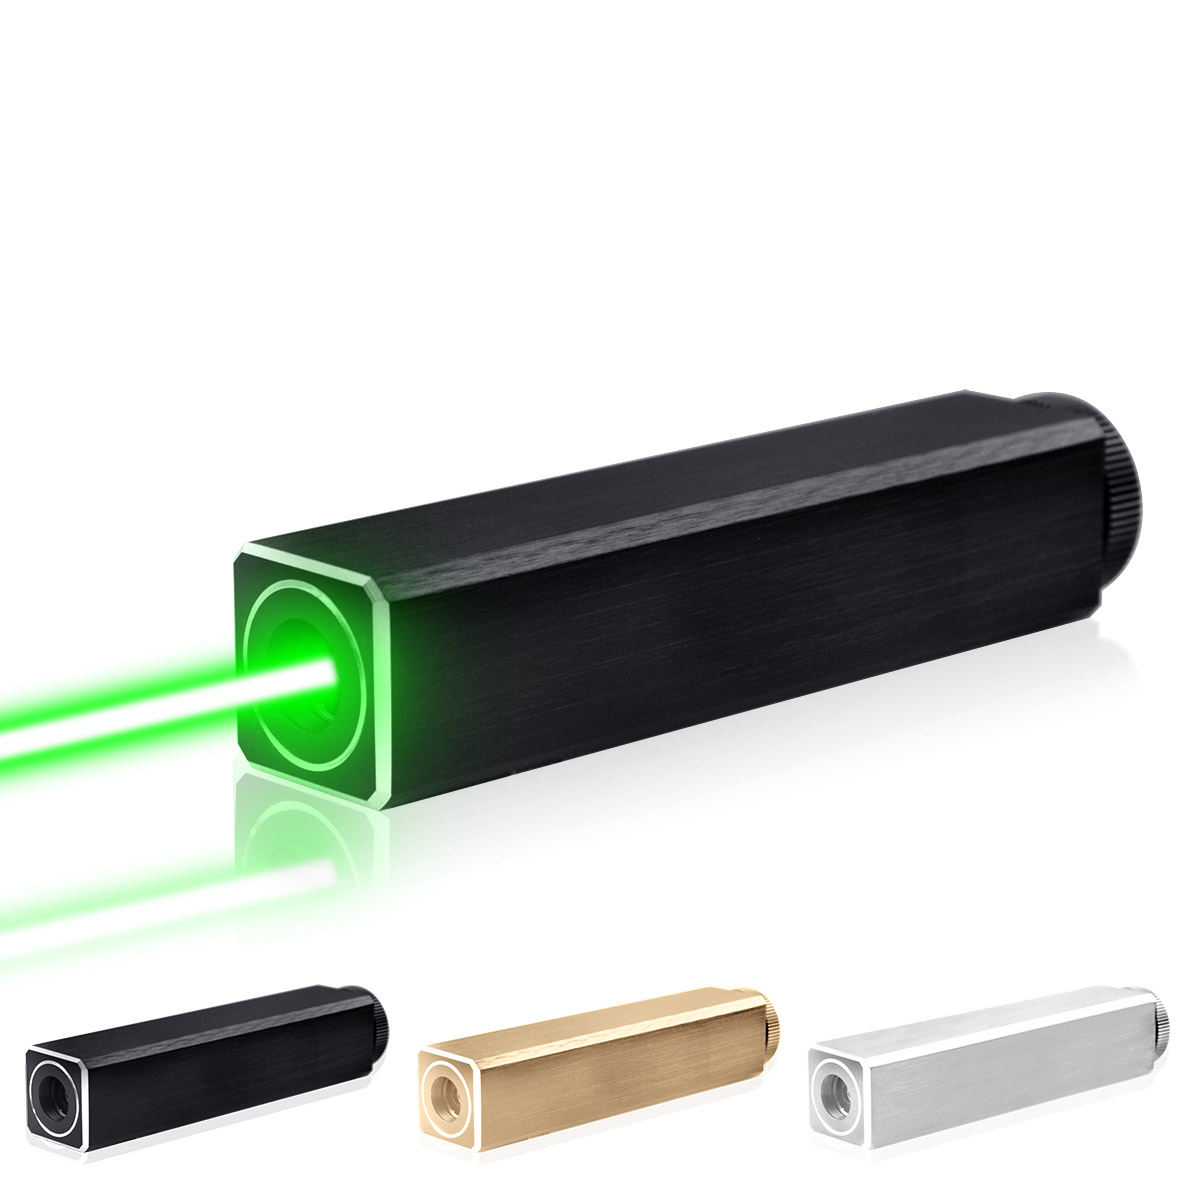 CWLASER 532nm vert/450nm bleu/405nm violet/650nm rouge pointeur Laser de forme carrée (3 couleurs)